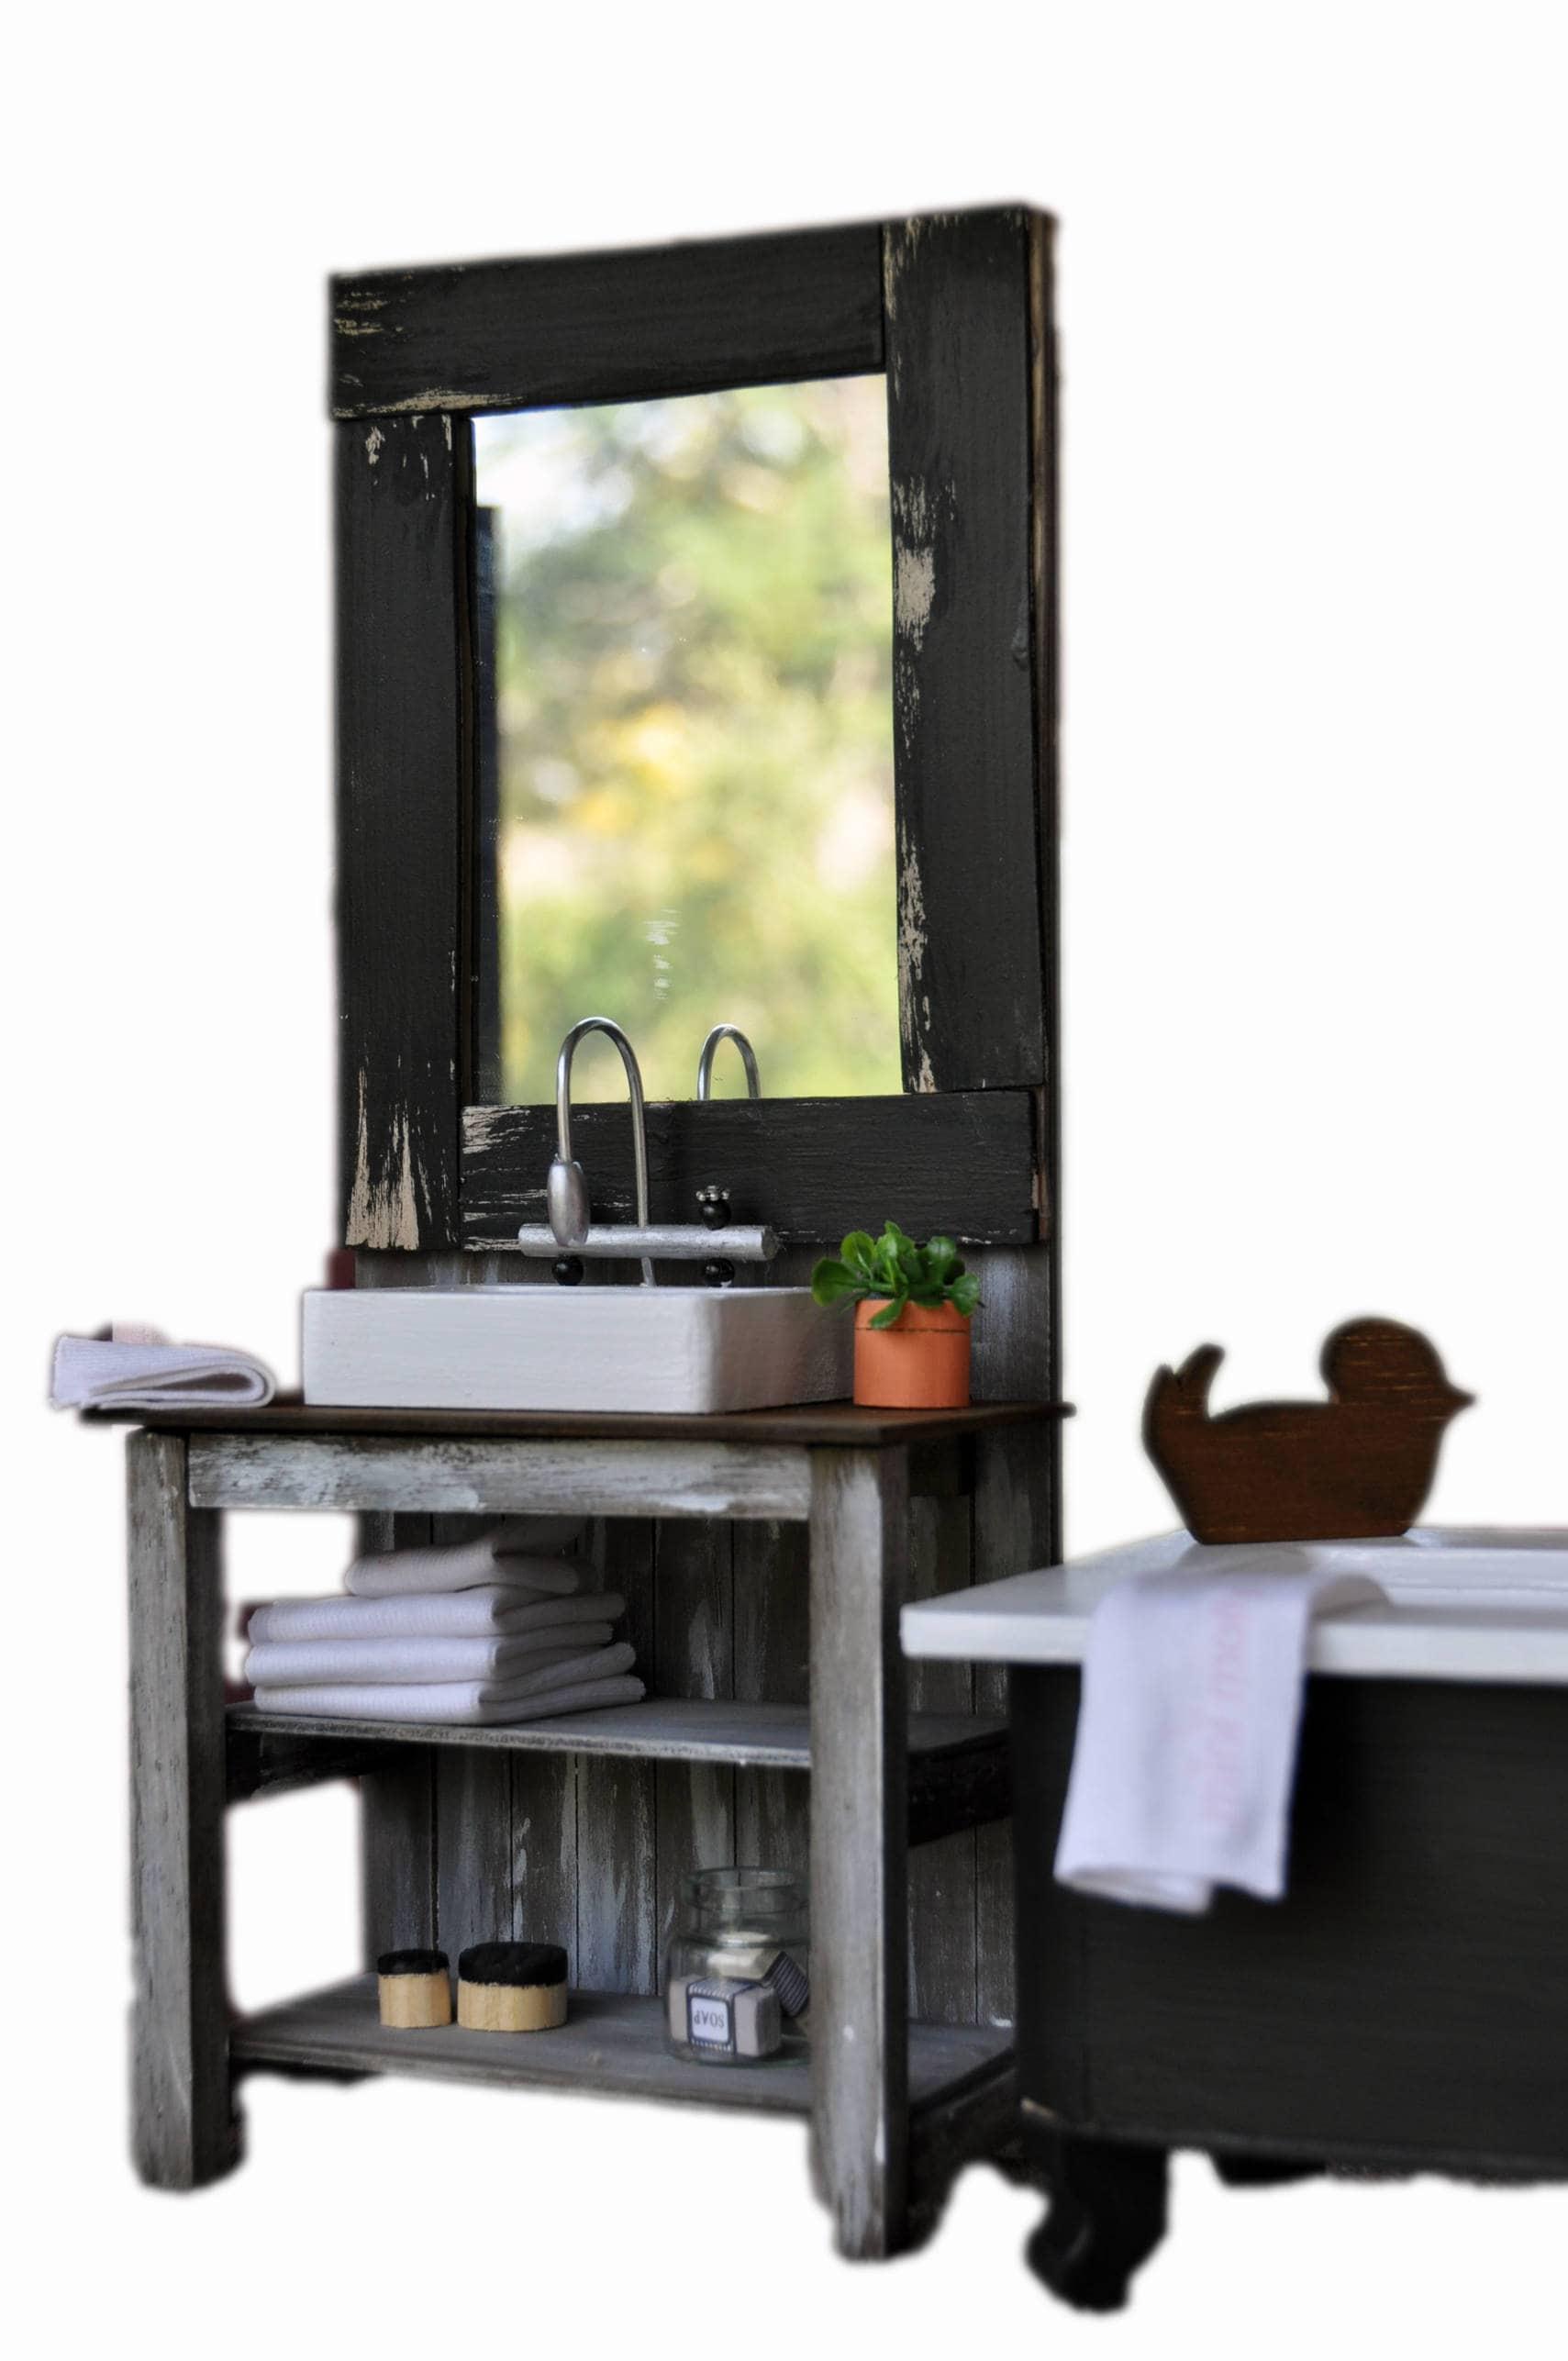 MiniMolly Dollhouse Furniture, Barbie Size Bathroom Set, French Provincial  Style Bath Vanity Toliet 1:6 Scale